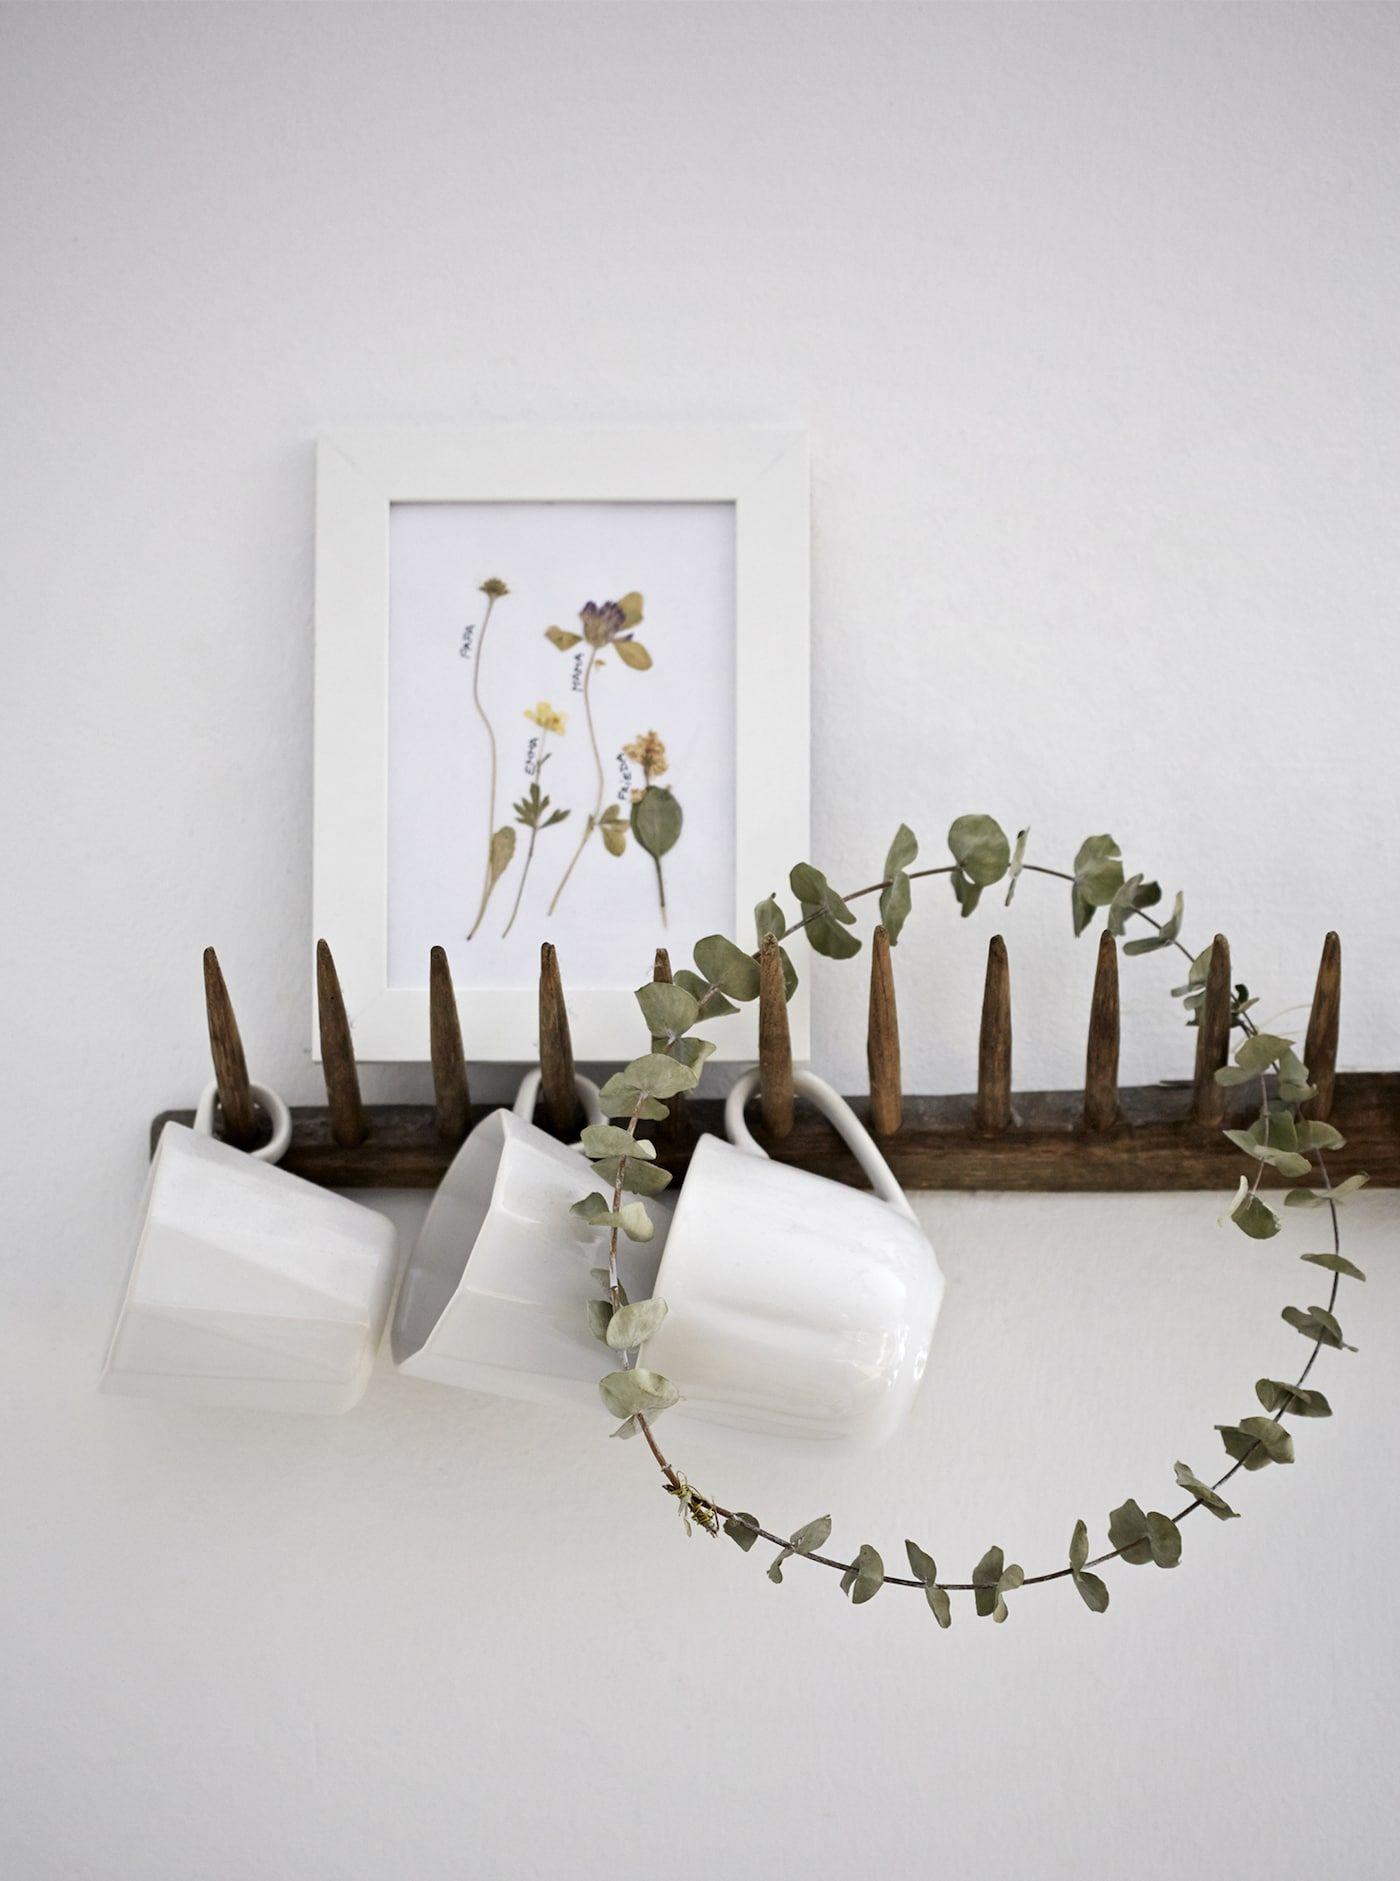 Dekorieren mit Eukalyptus  Dekorieren, Ideen dekorieren, Eukalyptus